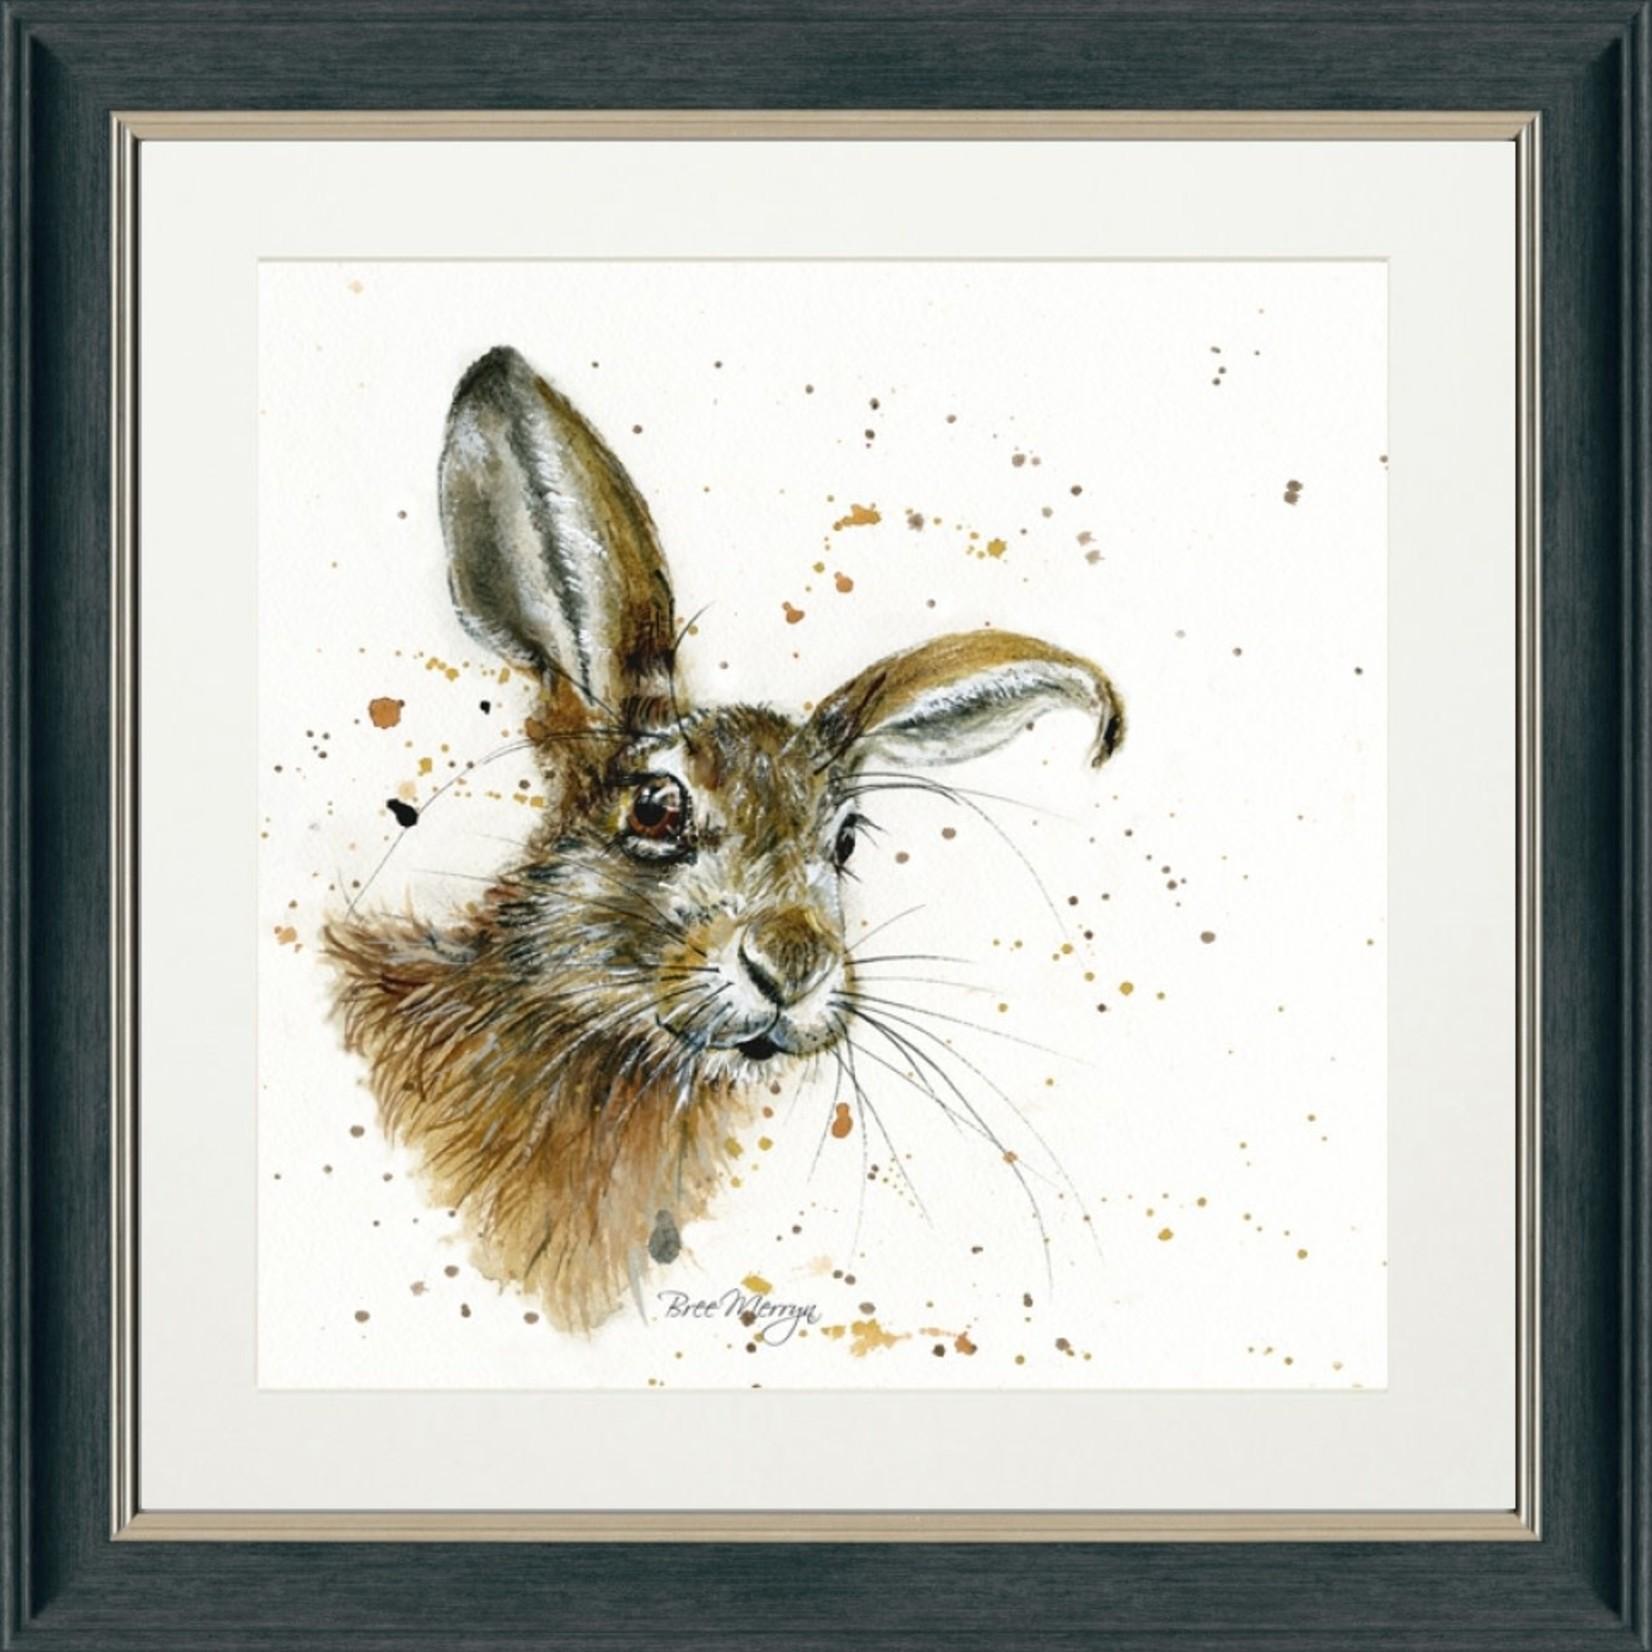 Bree Merryn Hamilton Charcoal Frame 48cm - Hare